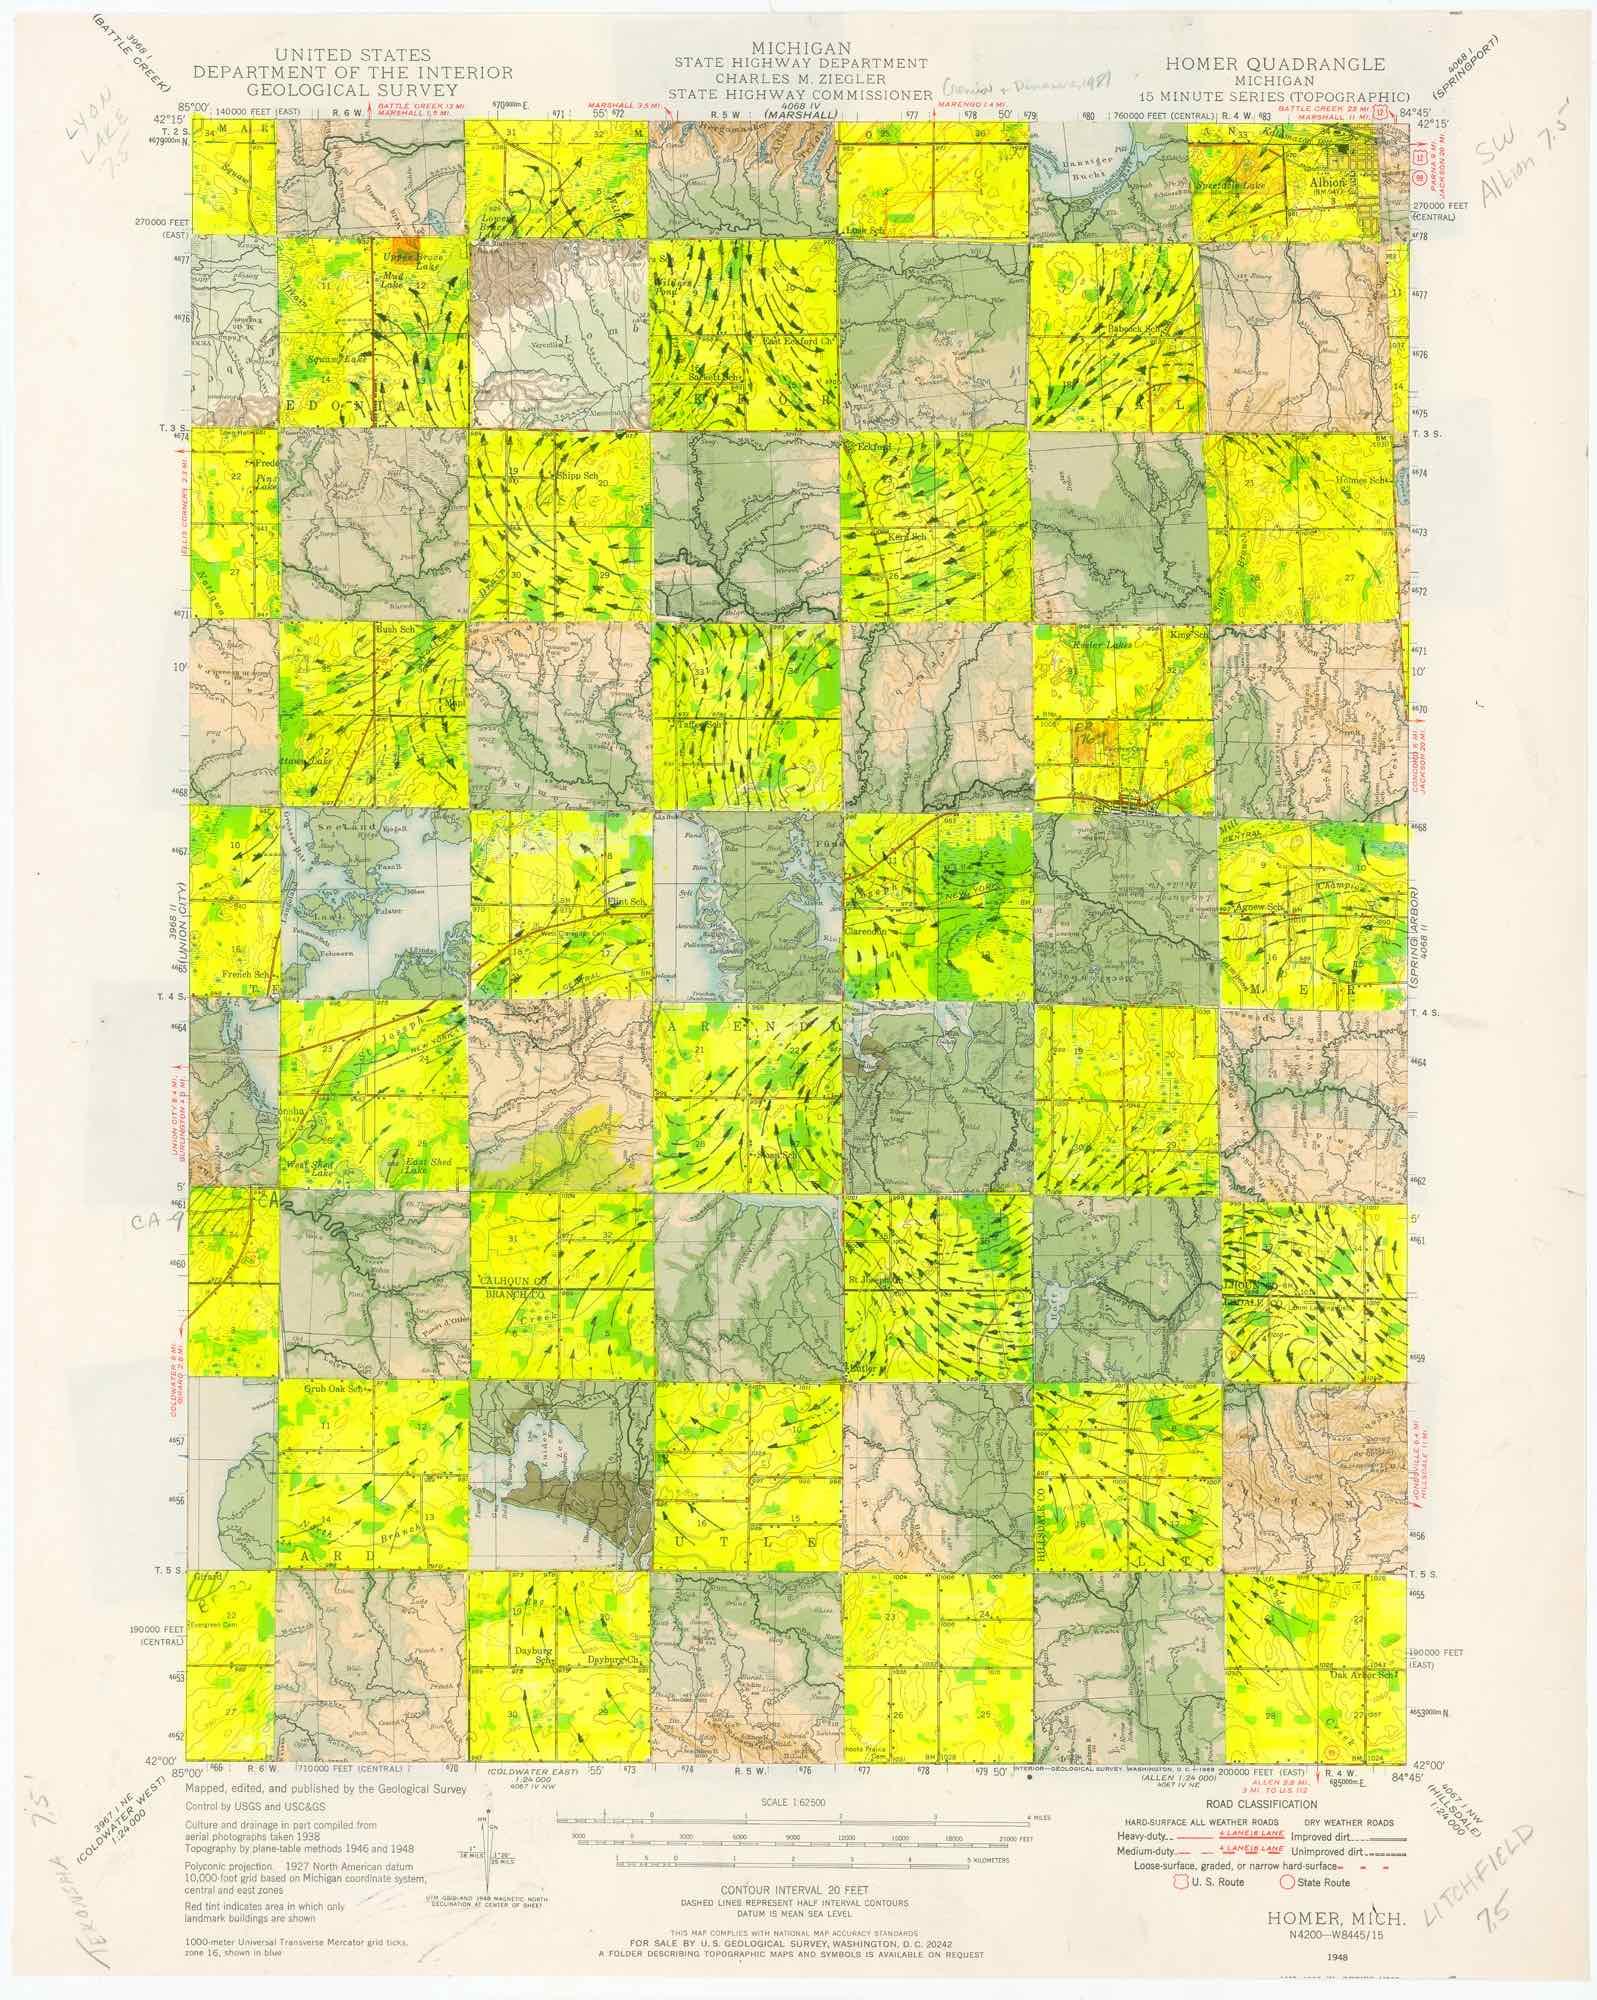 Stephan Huber - Lo & Behold 15, 2018, Pigmentprint, 52 x 43 cm /  20.5 x 16.9 in